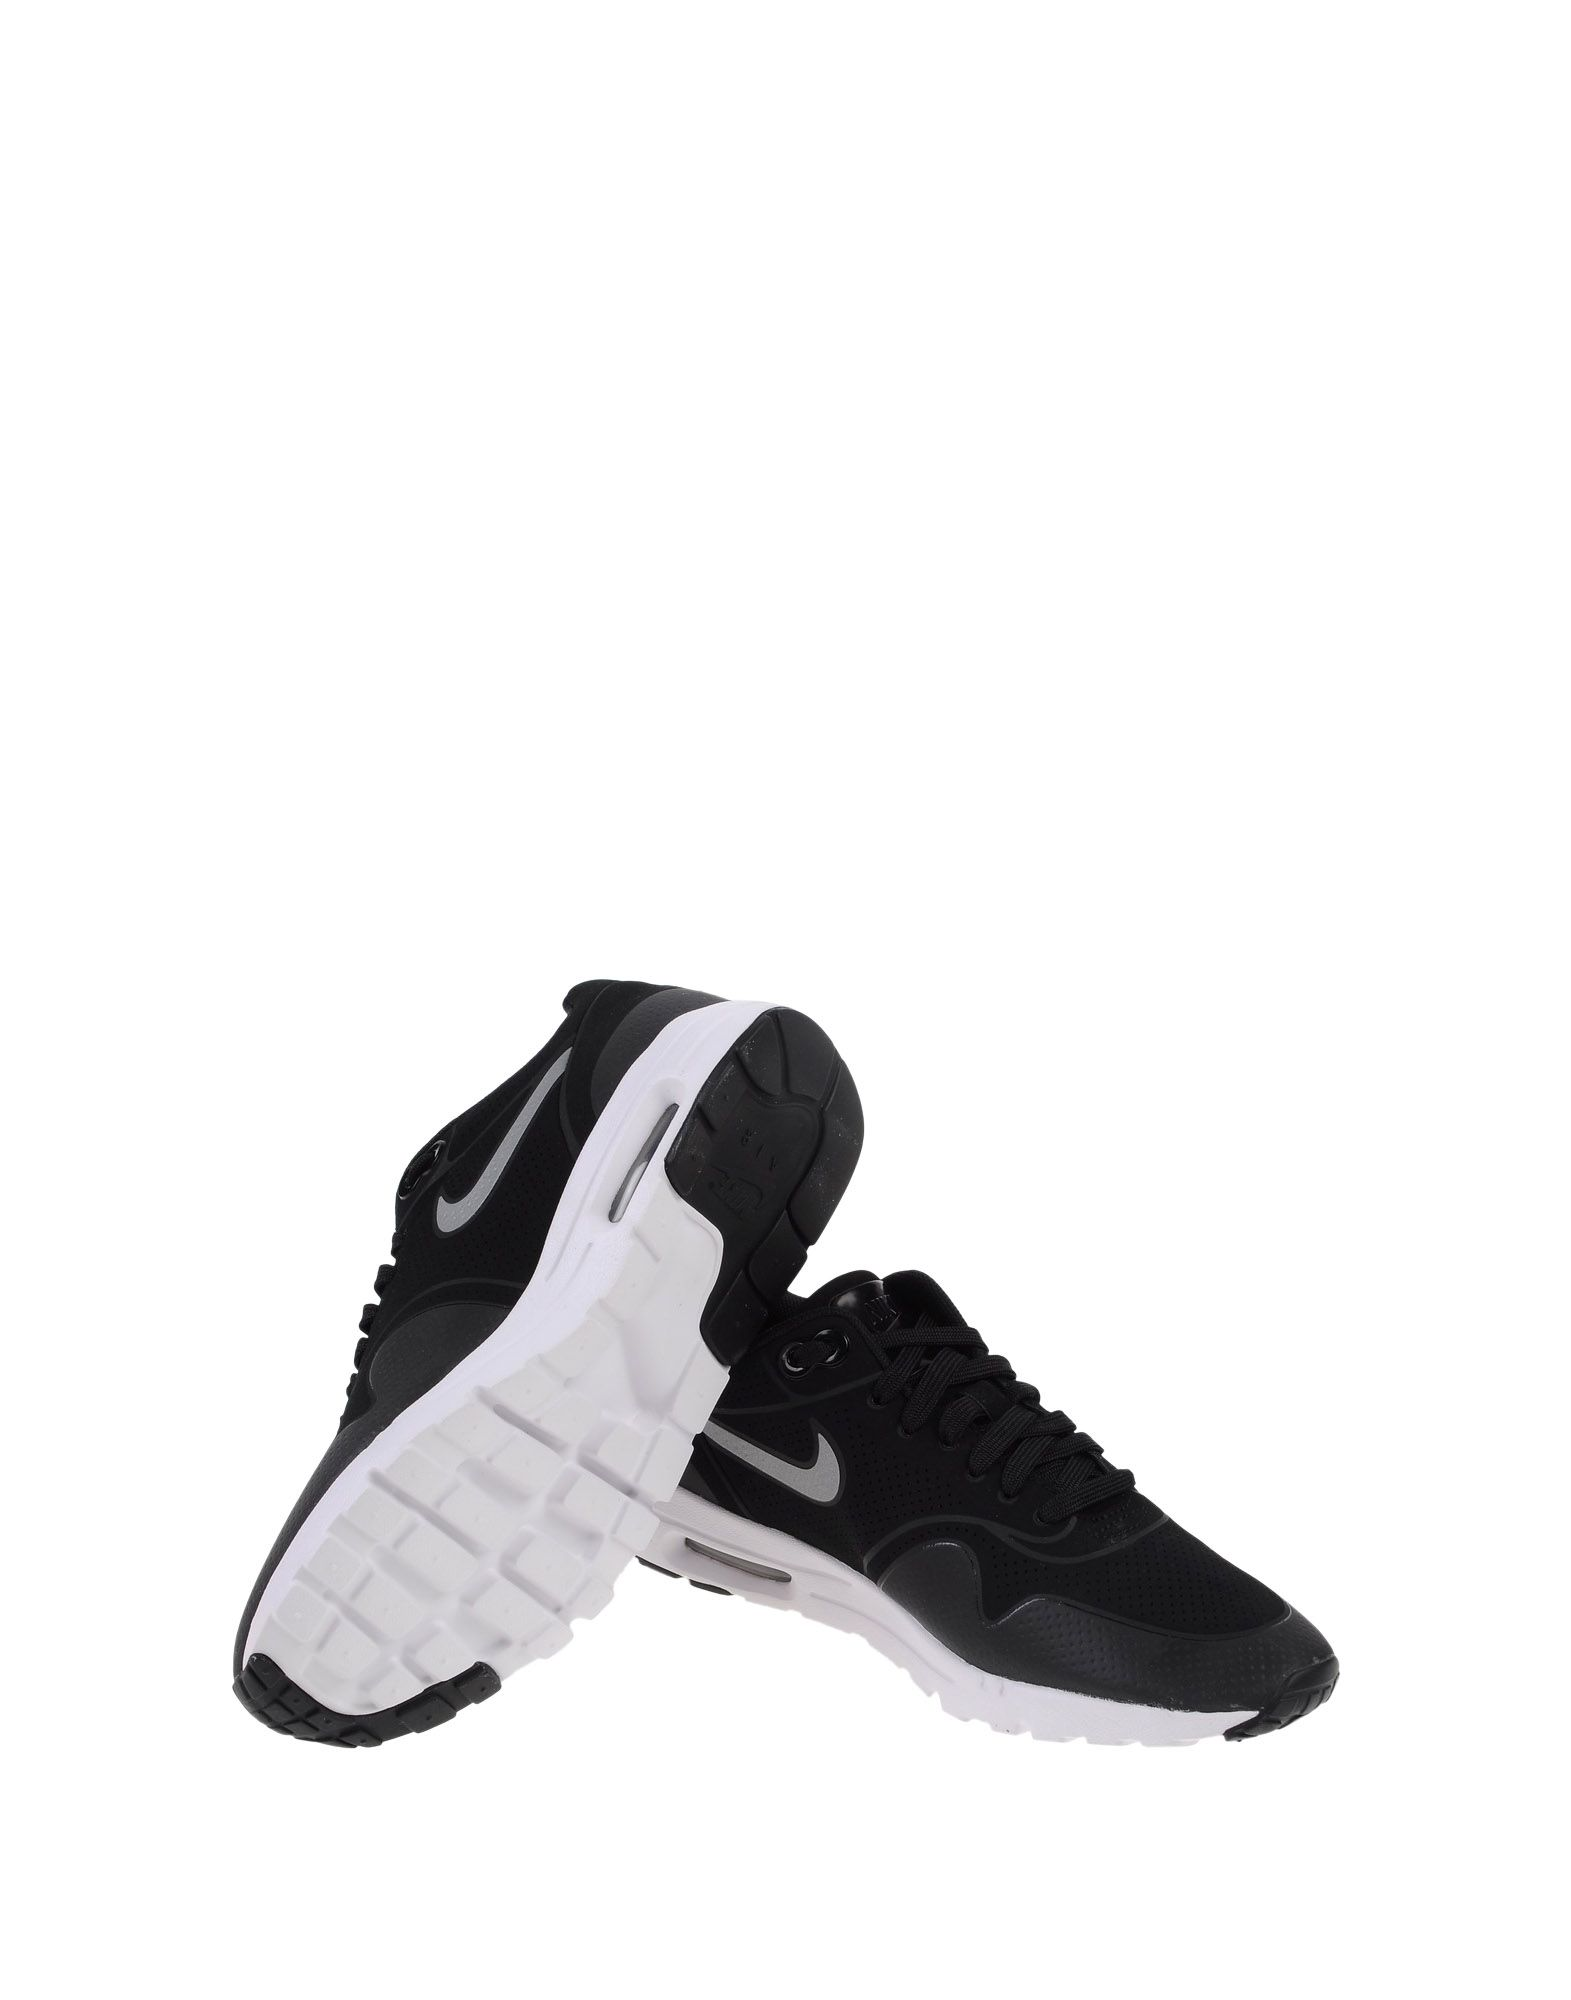 Gut 1 um billige Schuhe zu tragenNike  Air Max 1 Gut Ultra Moire  44781804QM 383cca